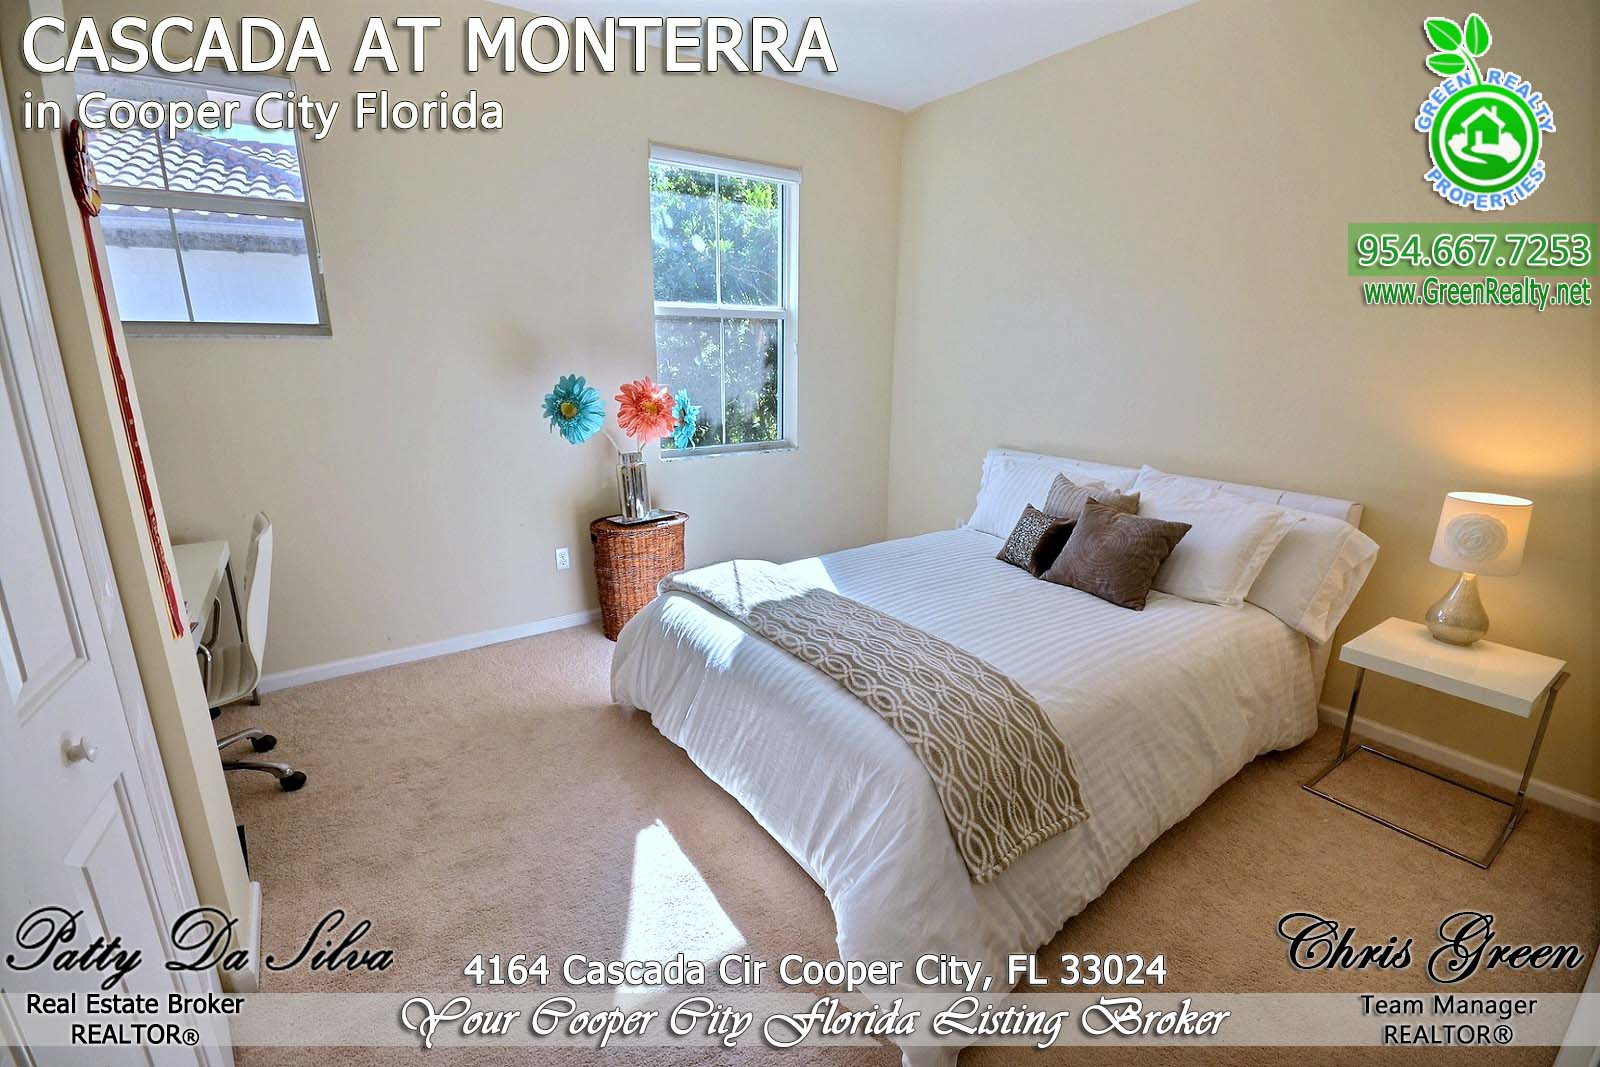 15 Cascada Monterra Cooper City Townhomes